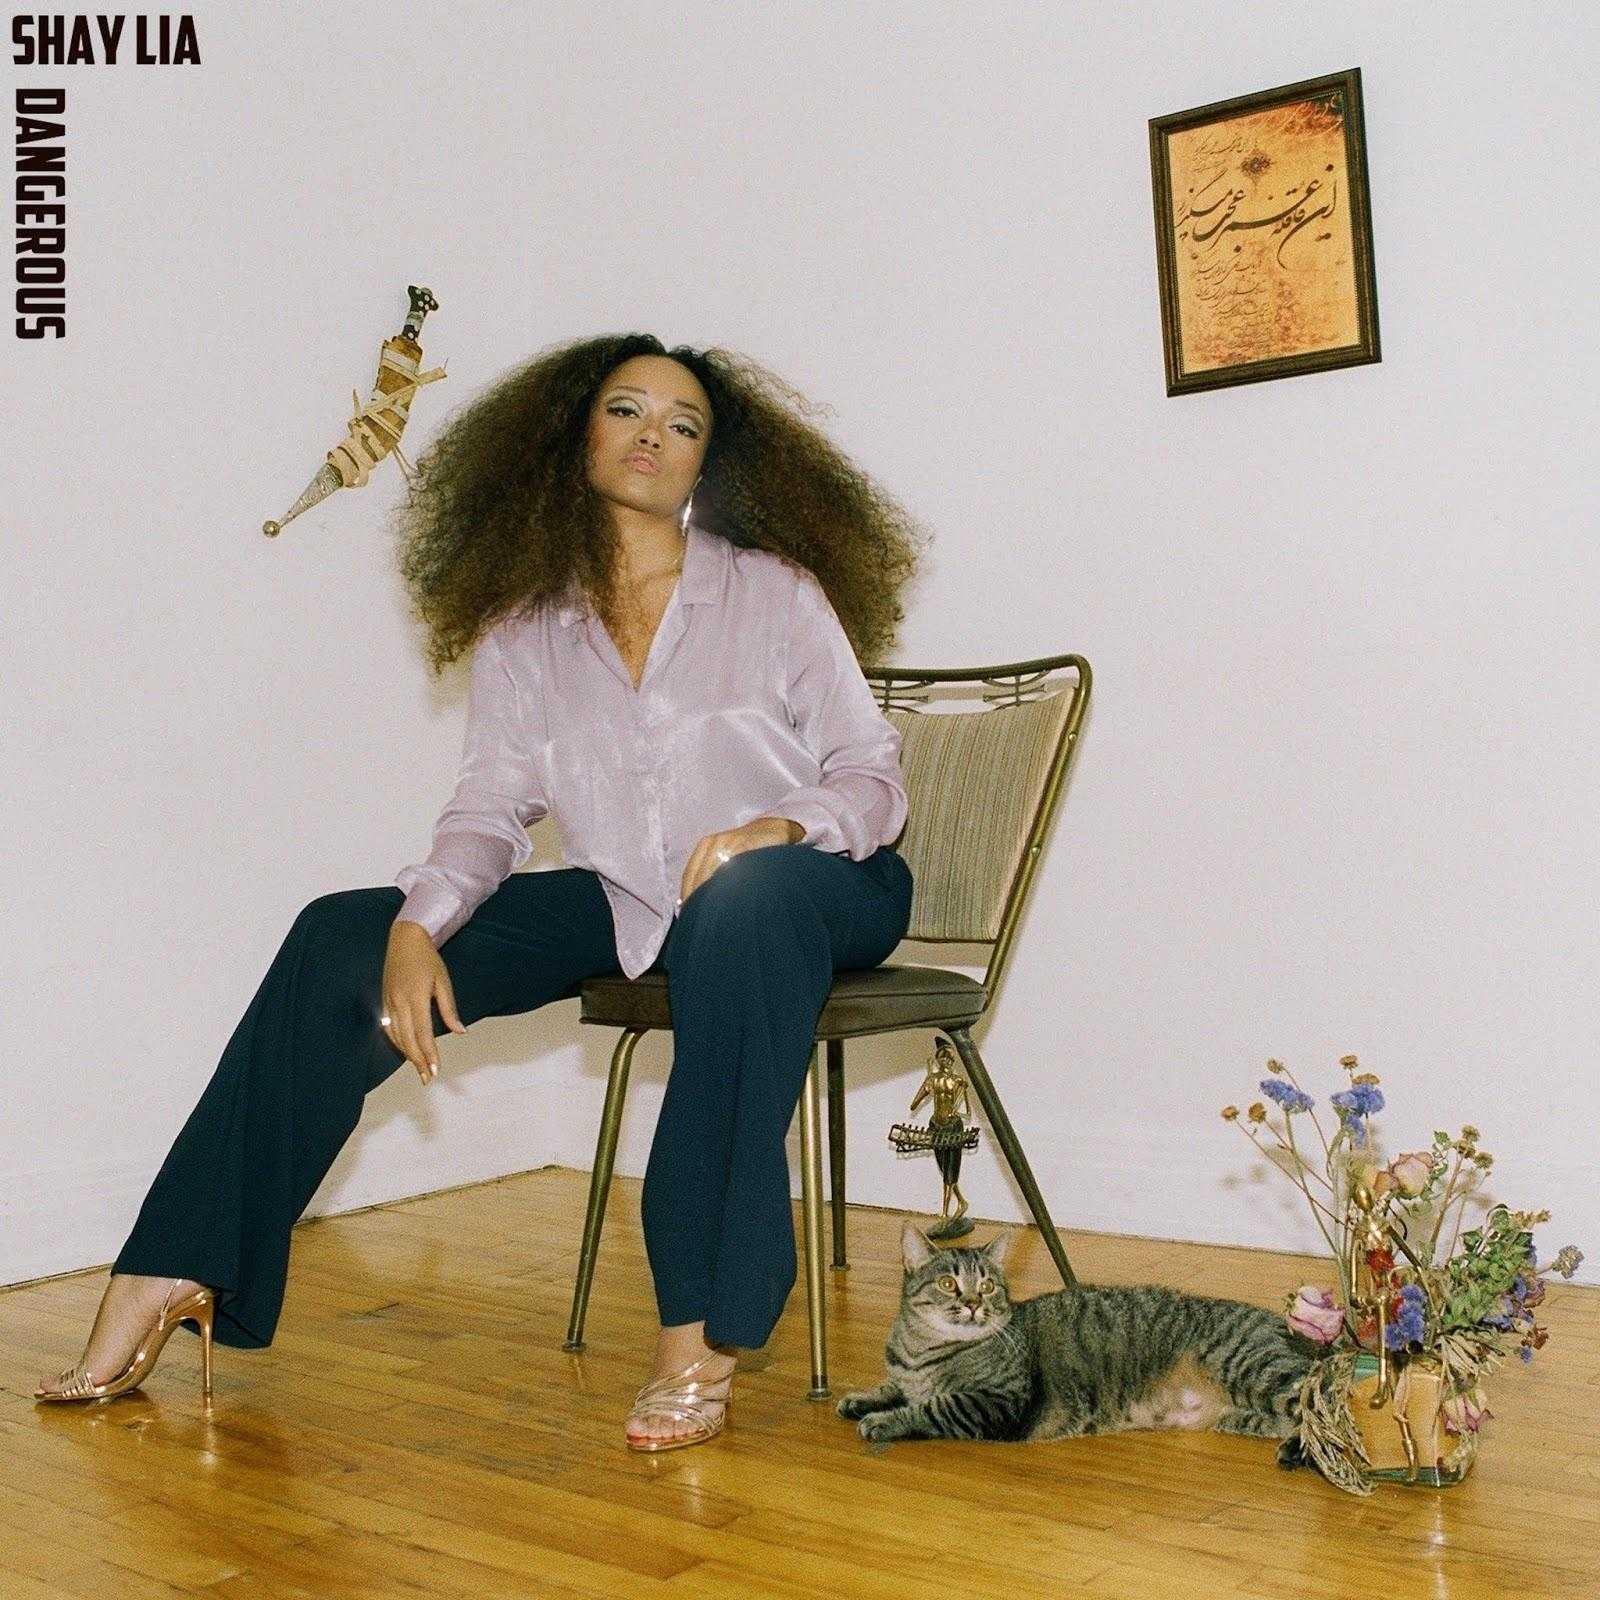 New Project: Shay Lia - Dangerous [Audio]